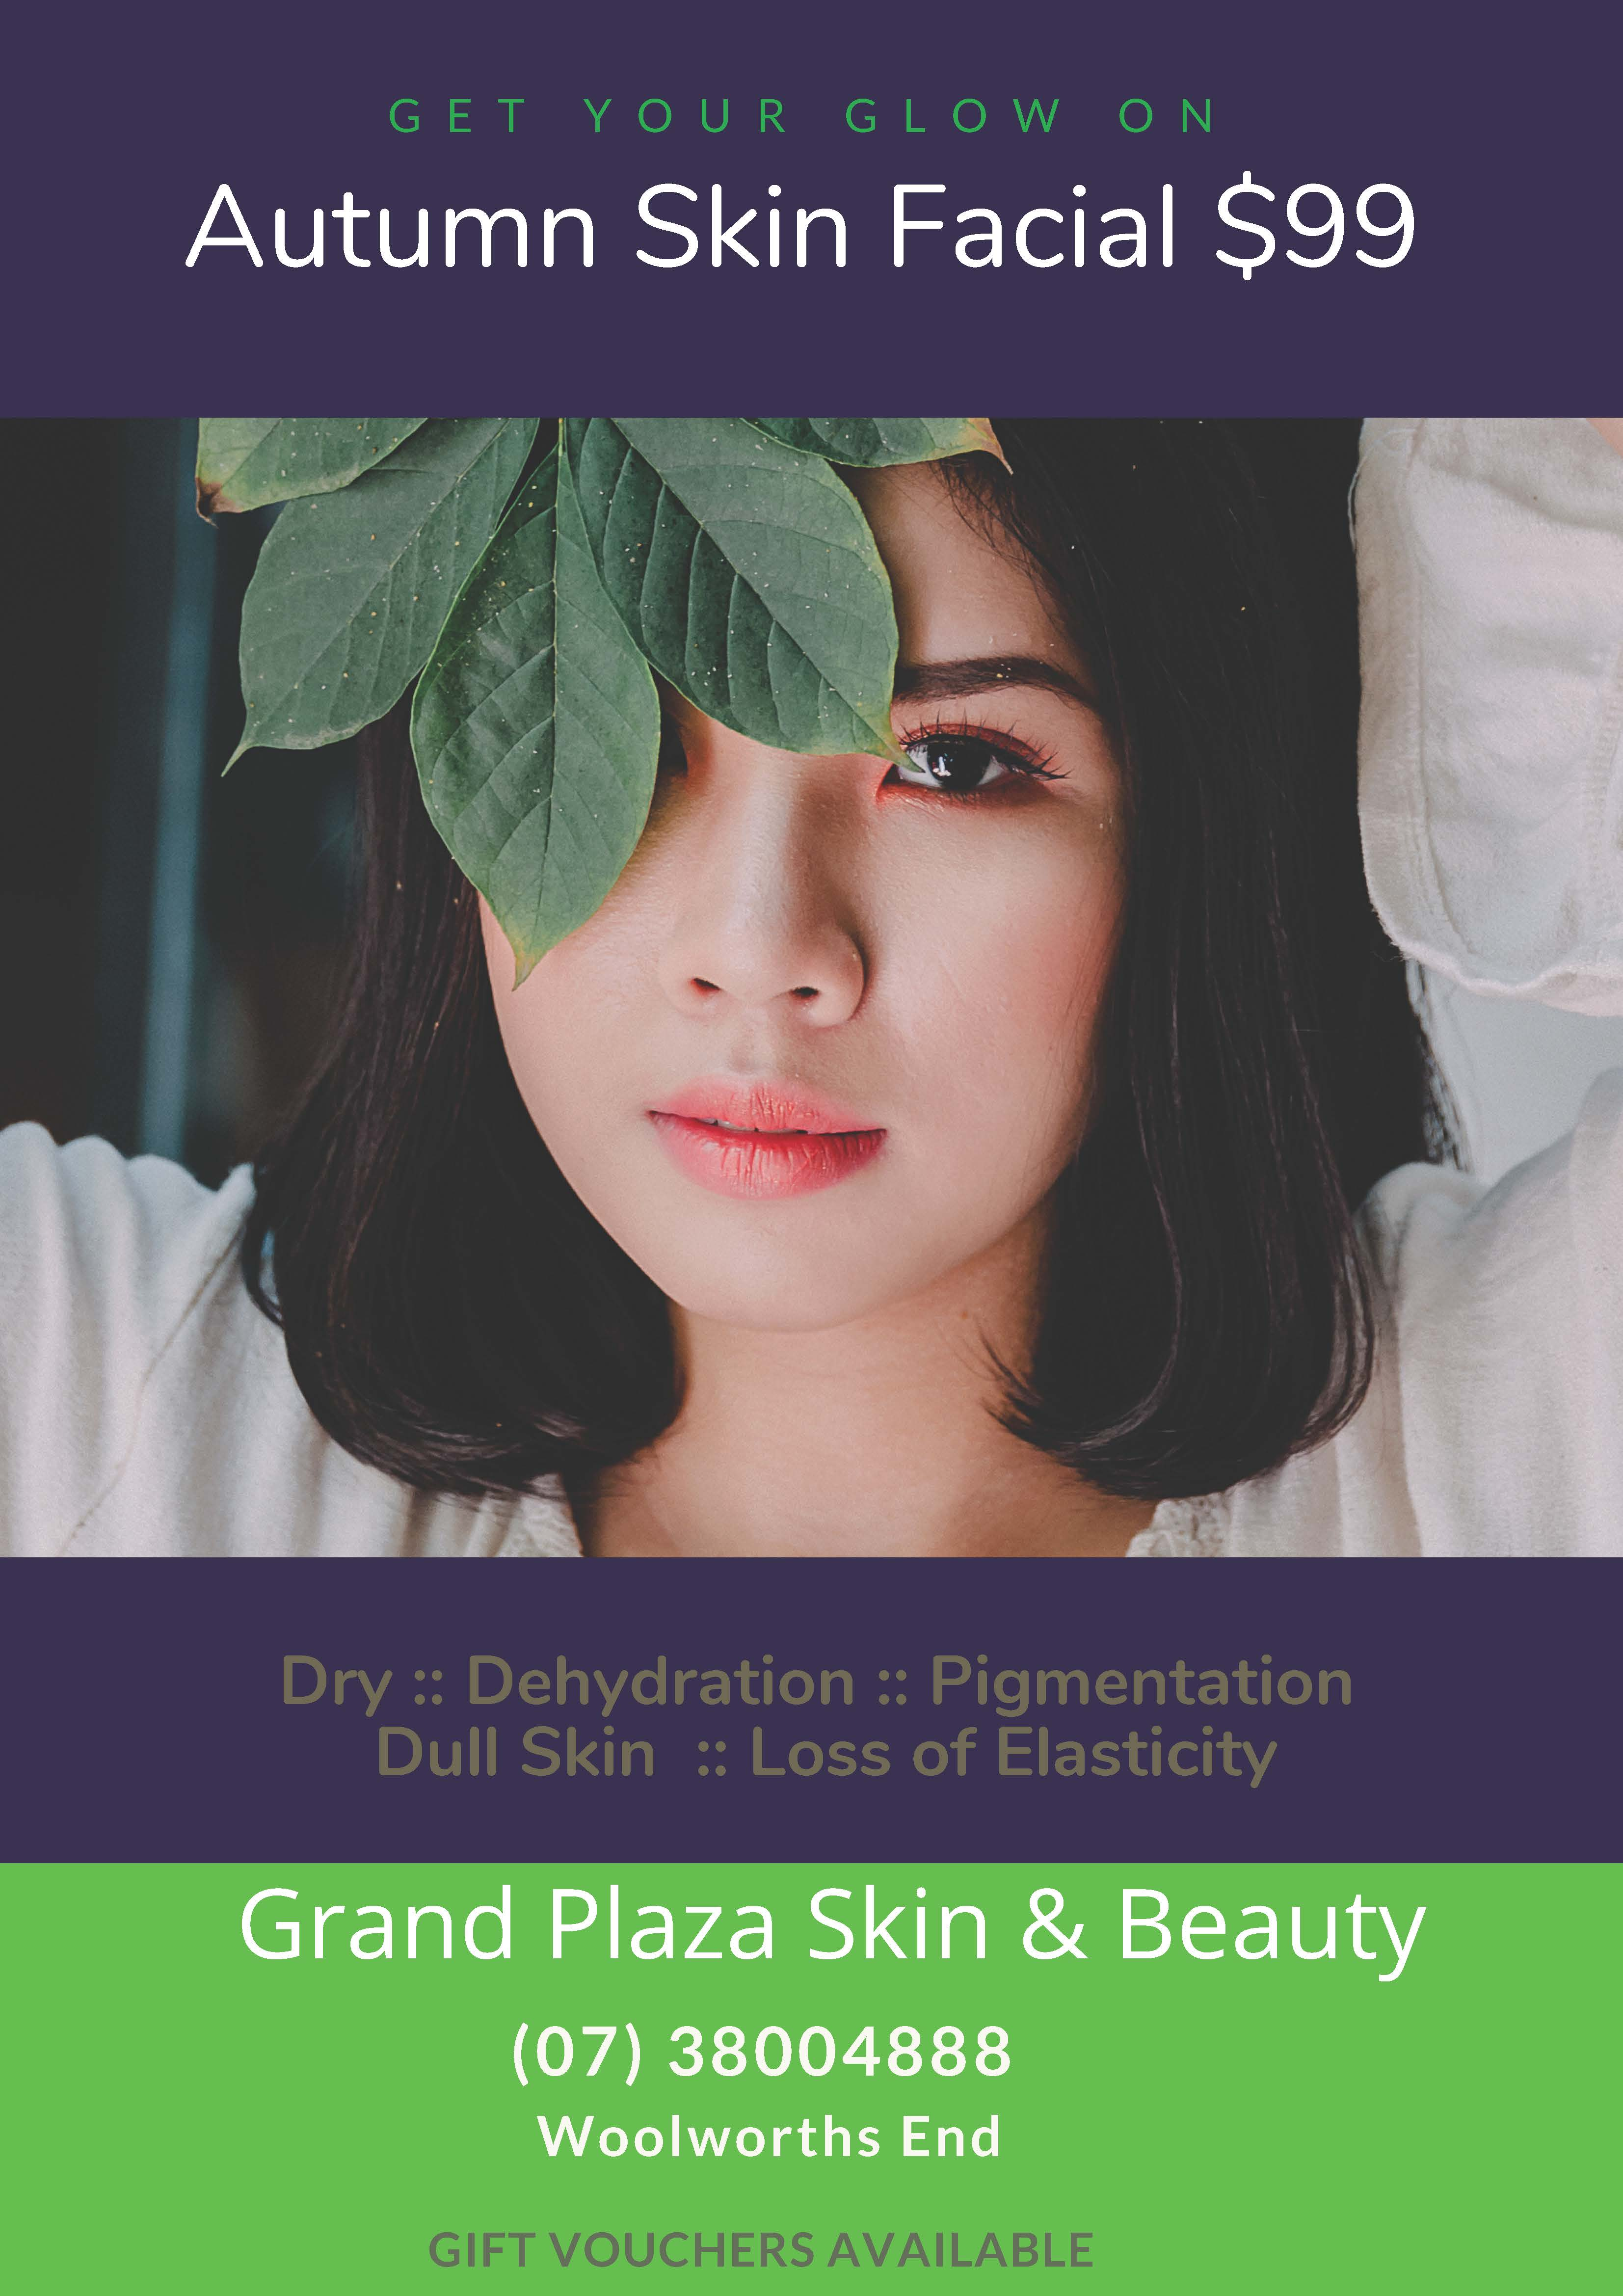 Grand Plaza Skin & Beauty Offer